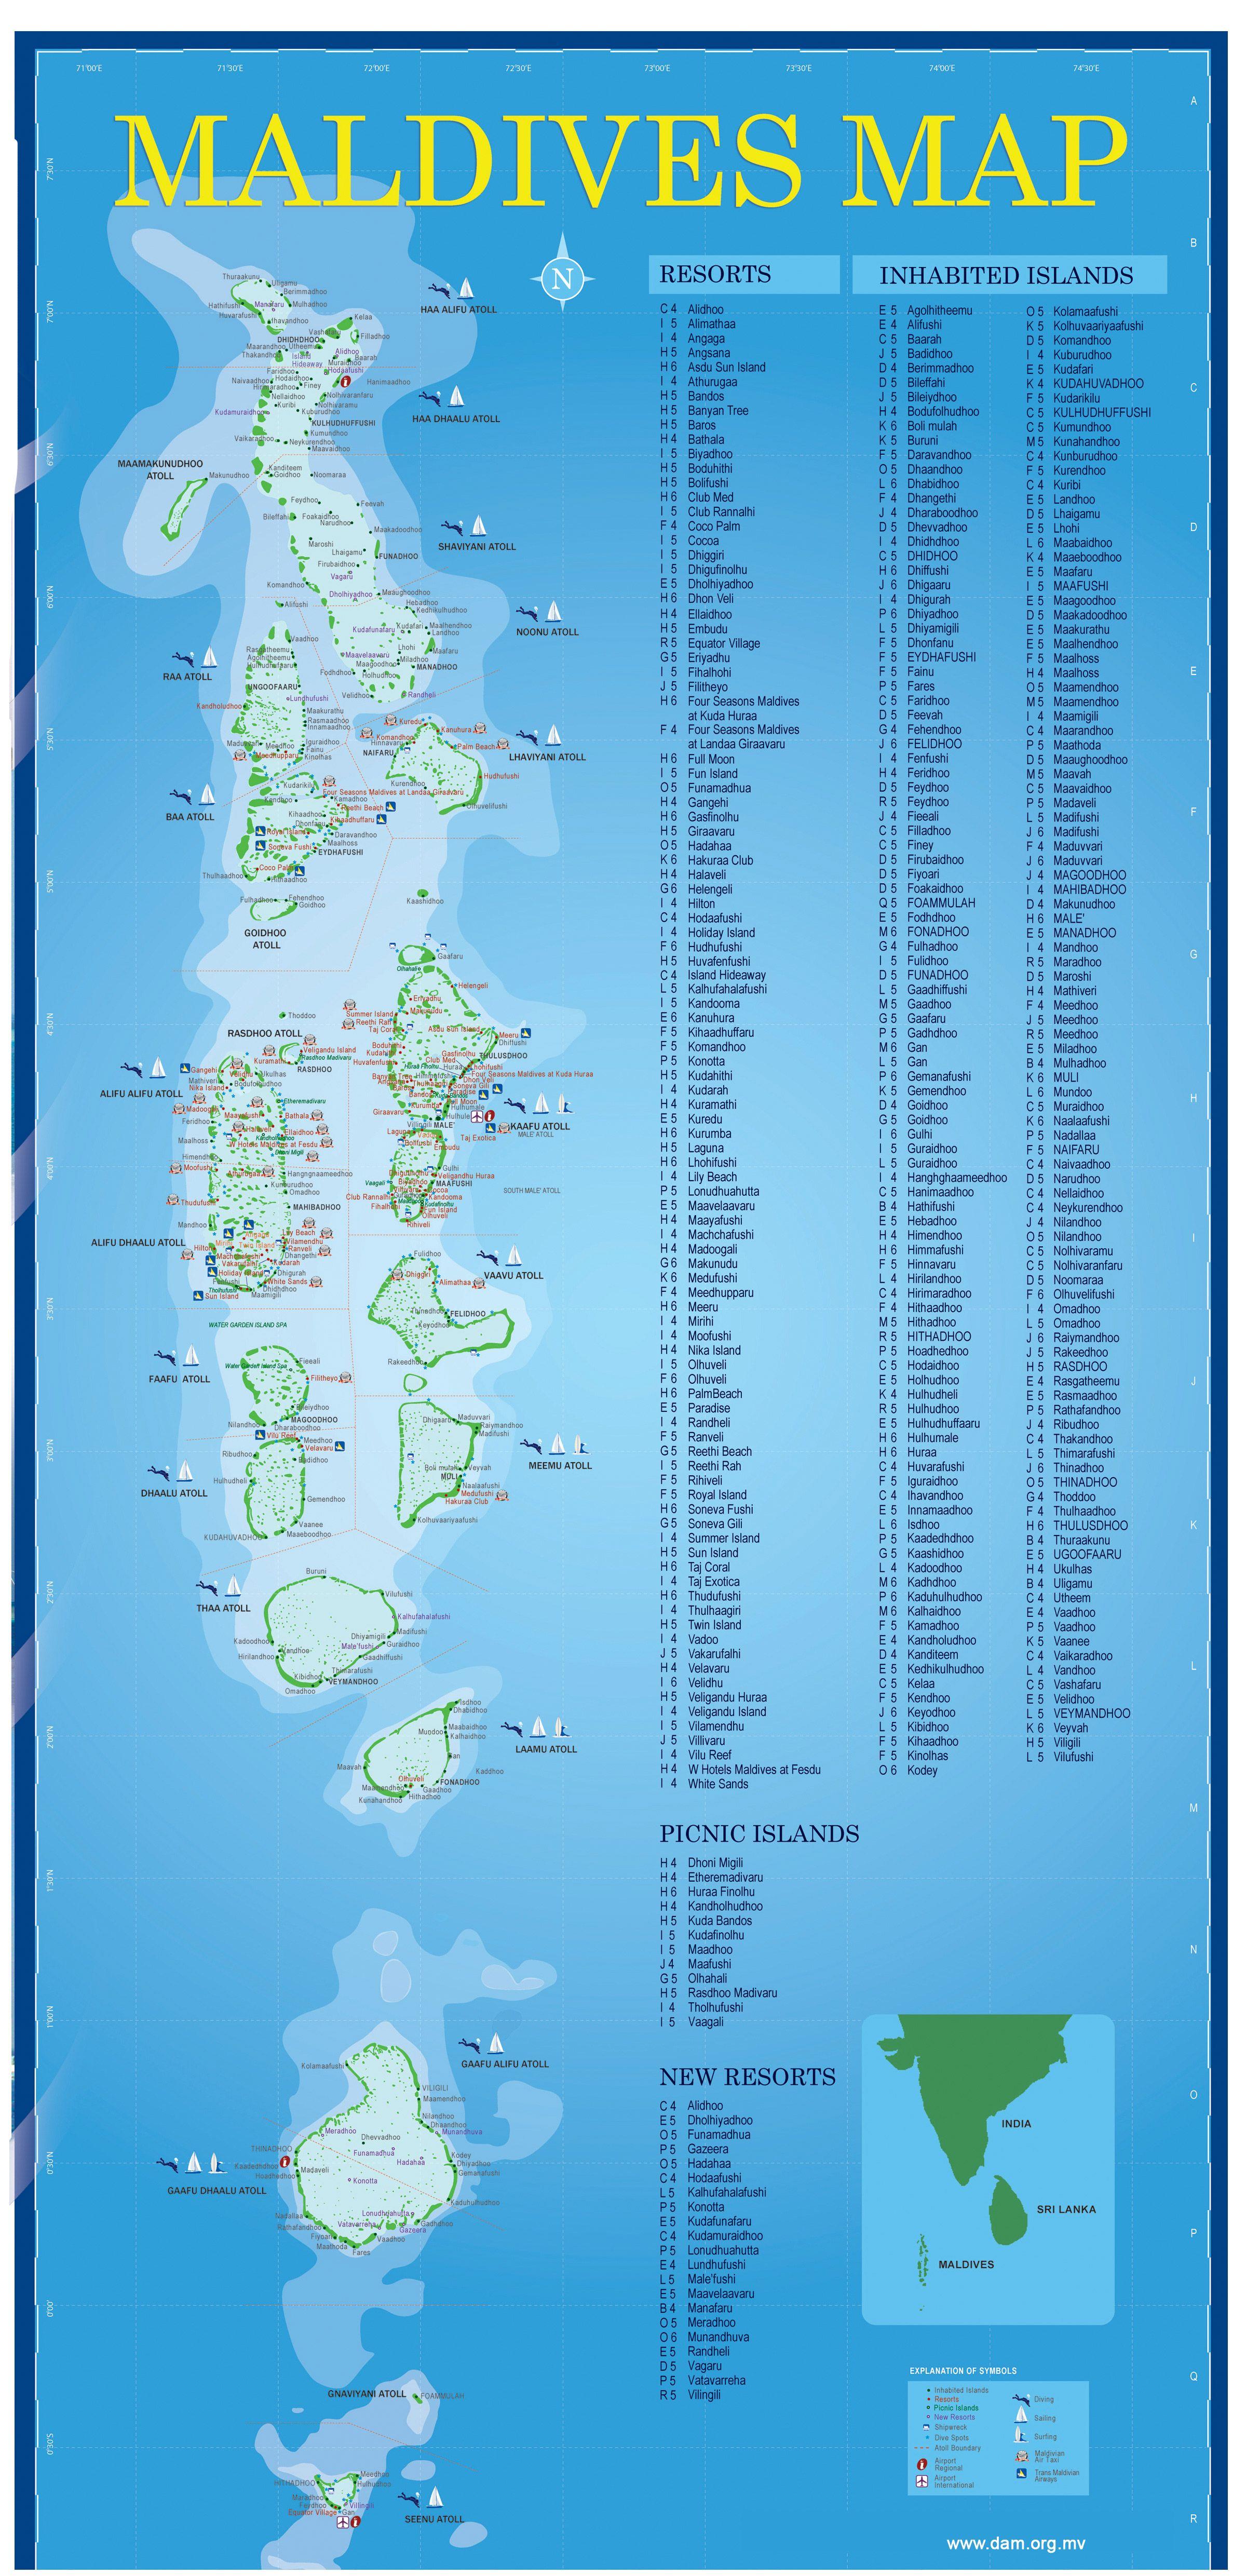 Maldives Maldives Travel Maldives Honeymoon Maldives